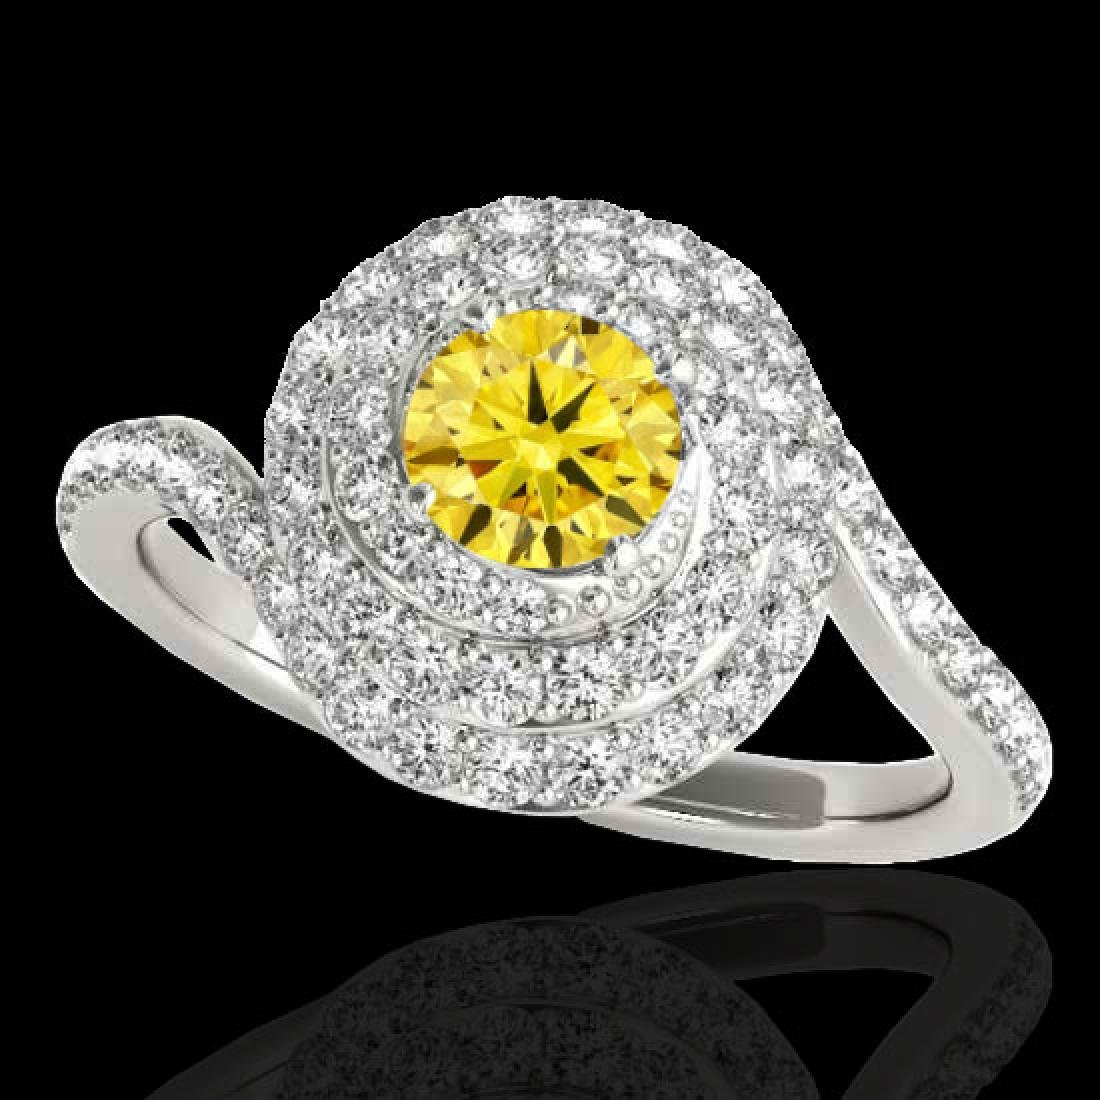 2.11 CTW Certified Si Fancy Intense Yellow Diamond